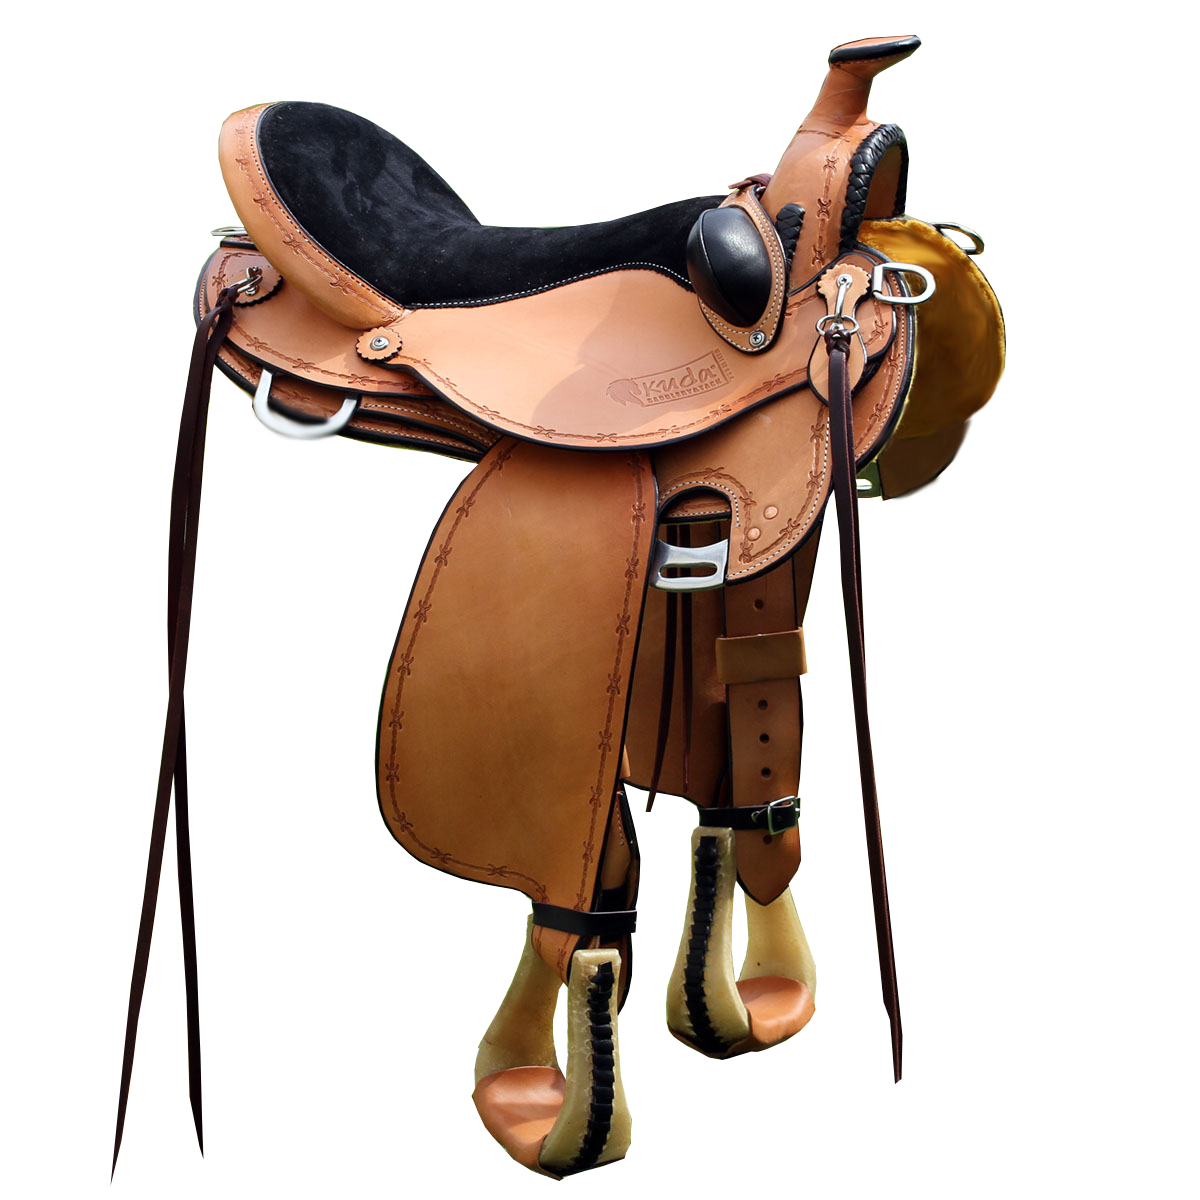 Kuda Elite Flex Saddle with horn